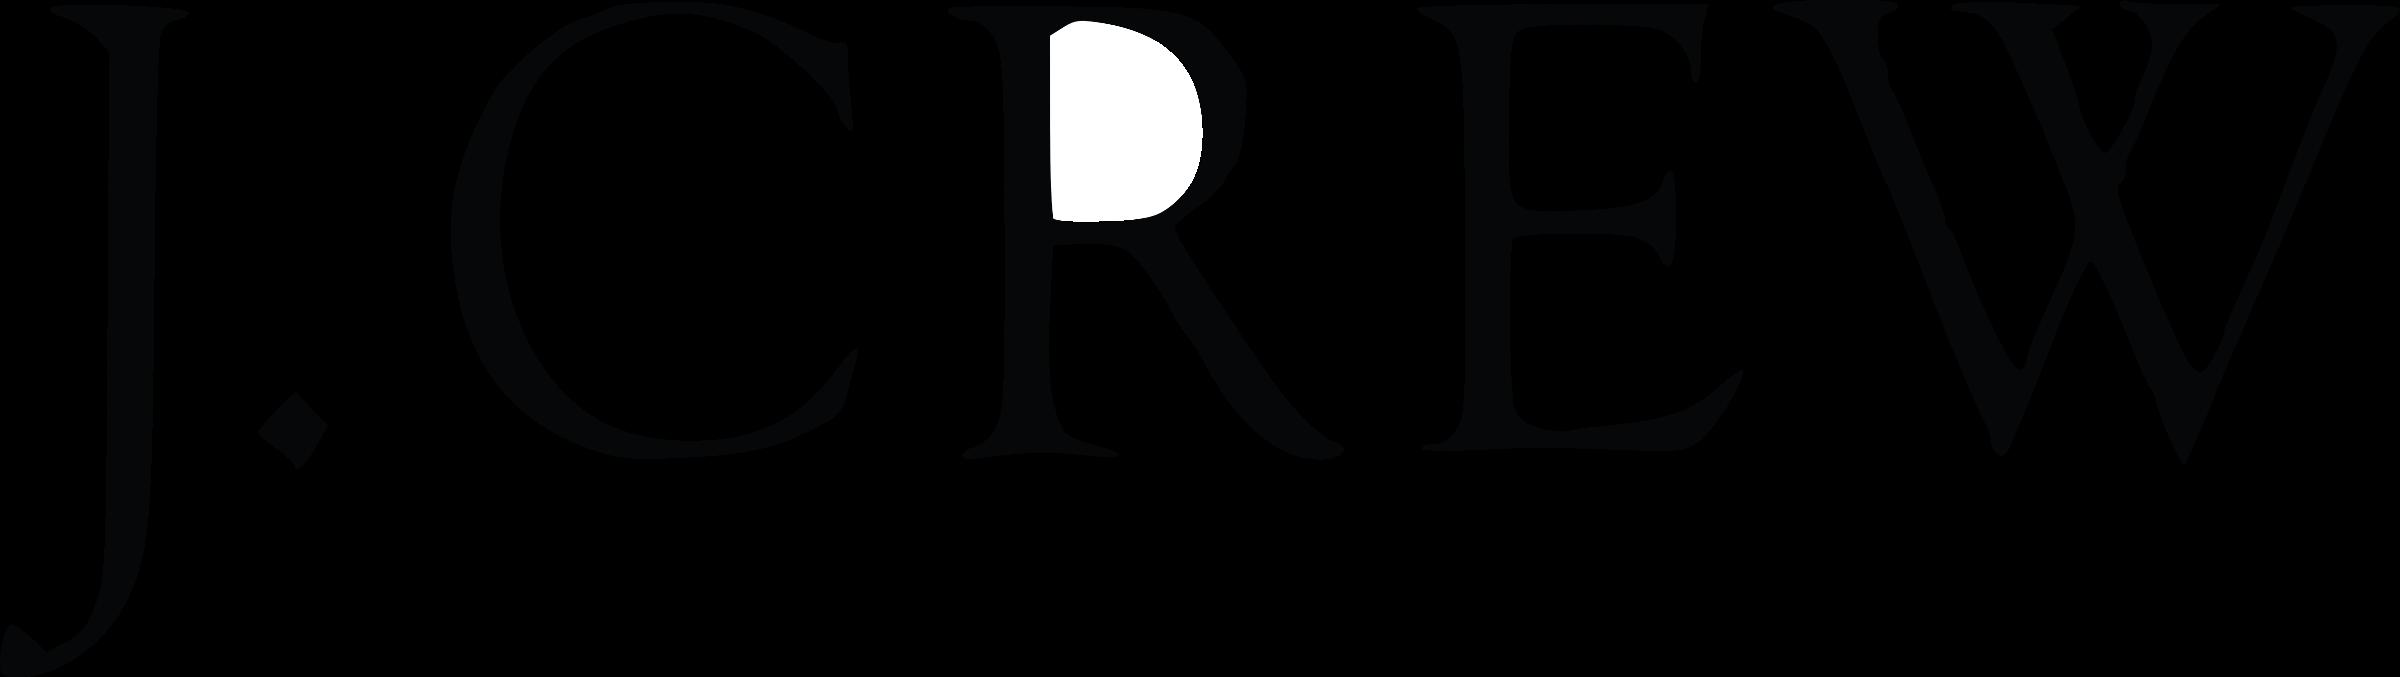 J. Crew Logo PNG Transparent & SVG Vector.